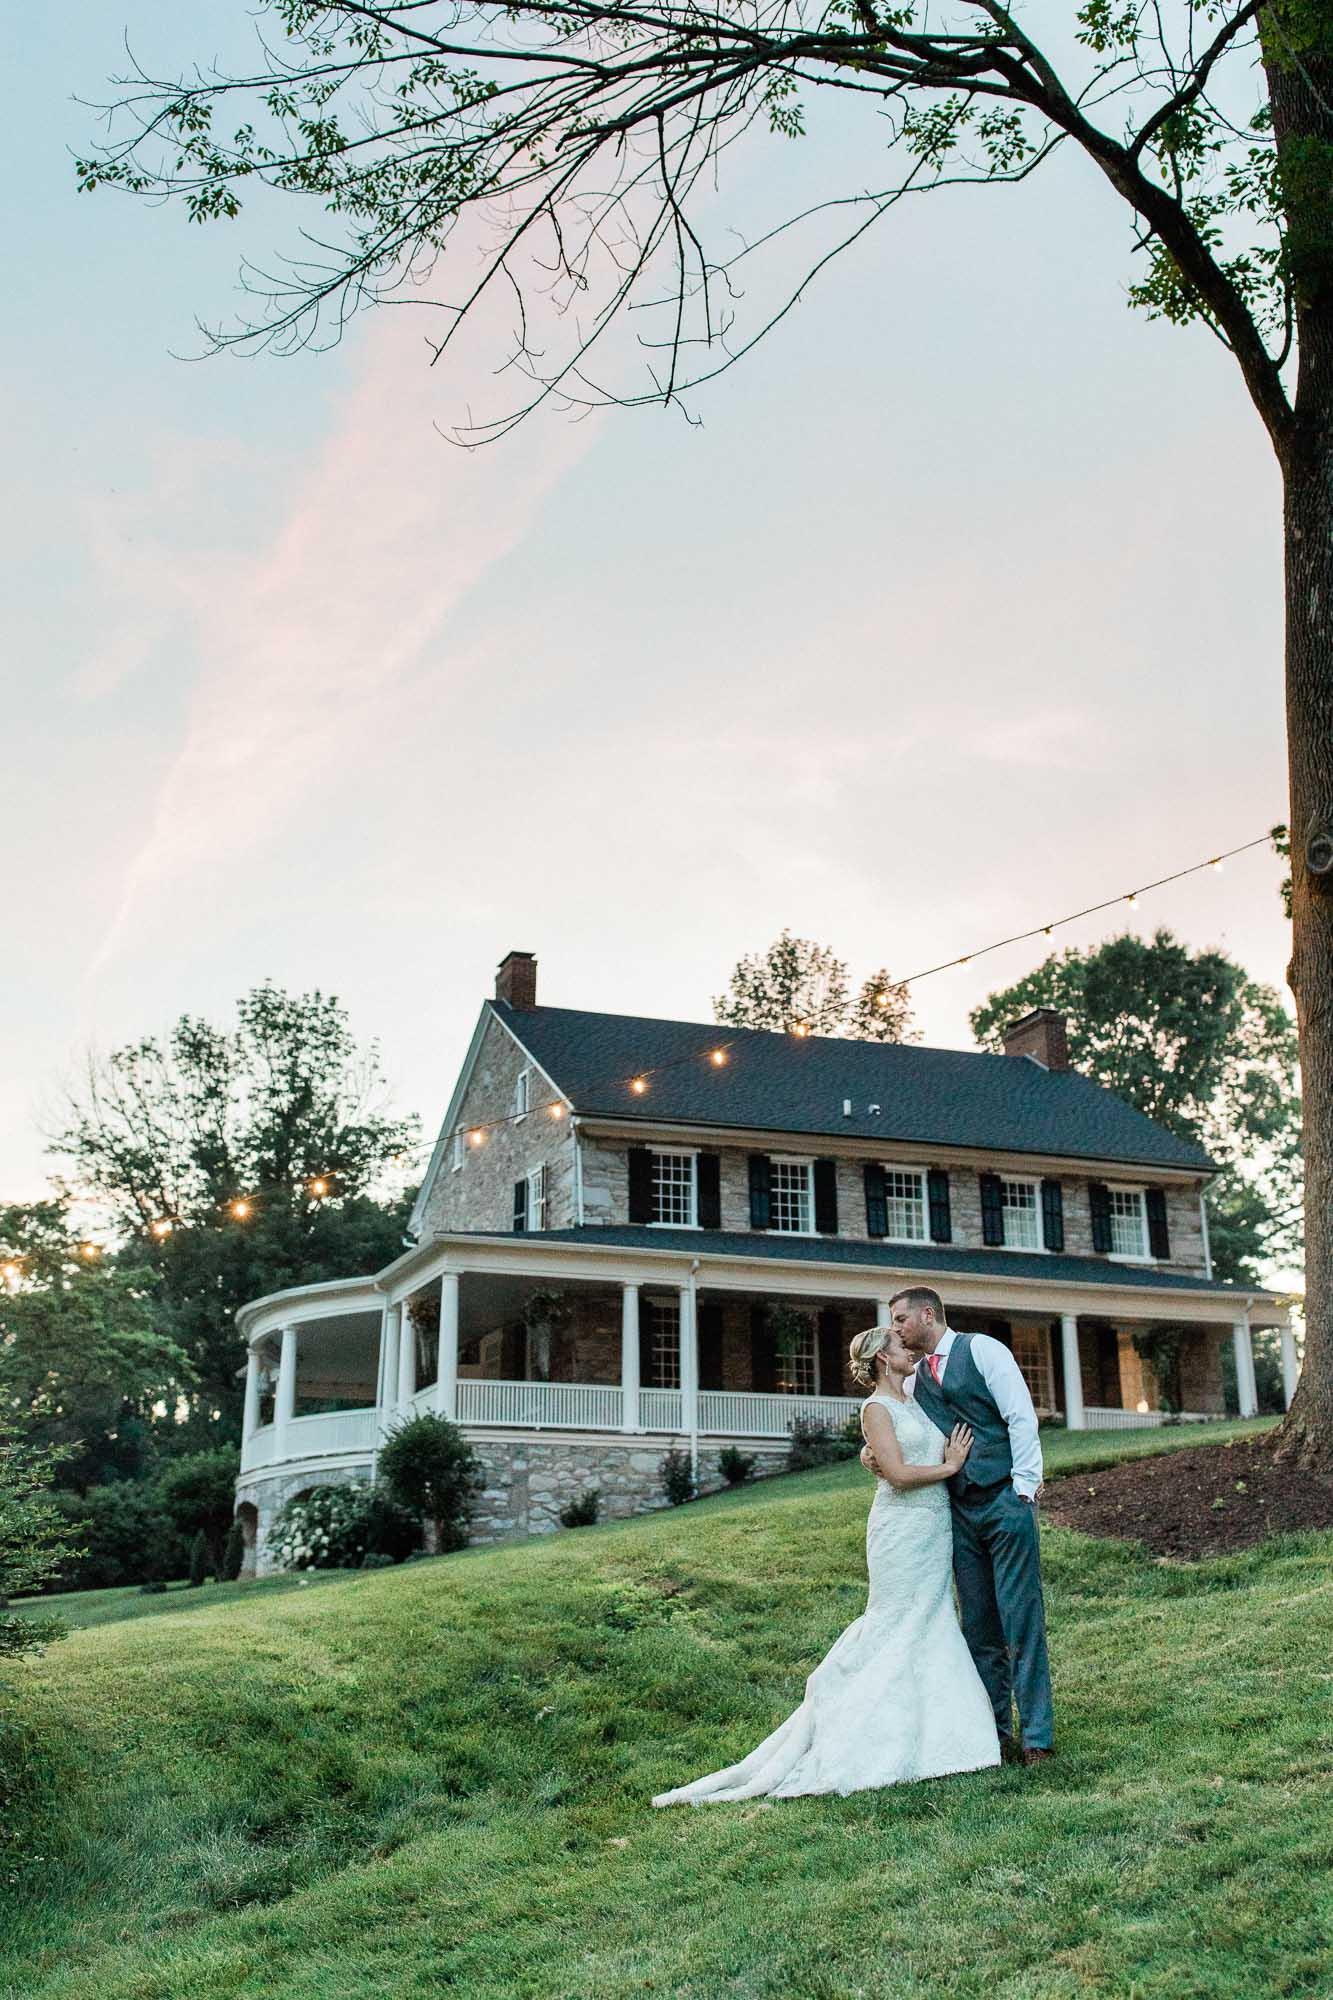 Allenberry-resort-historic-pennsylvania-wedding-10663.jpg